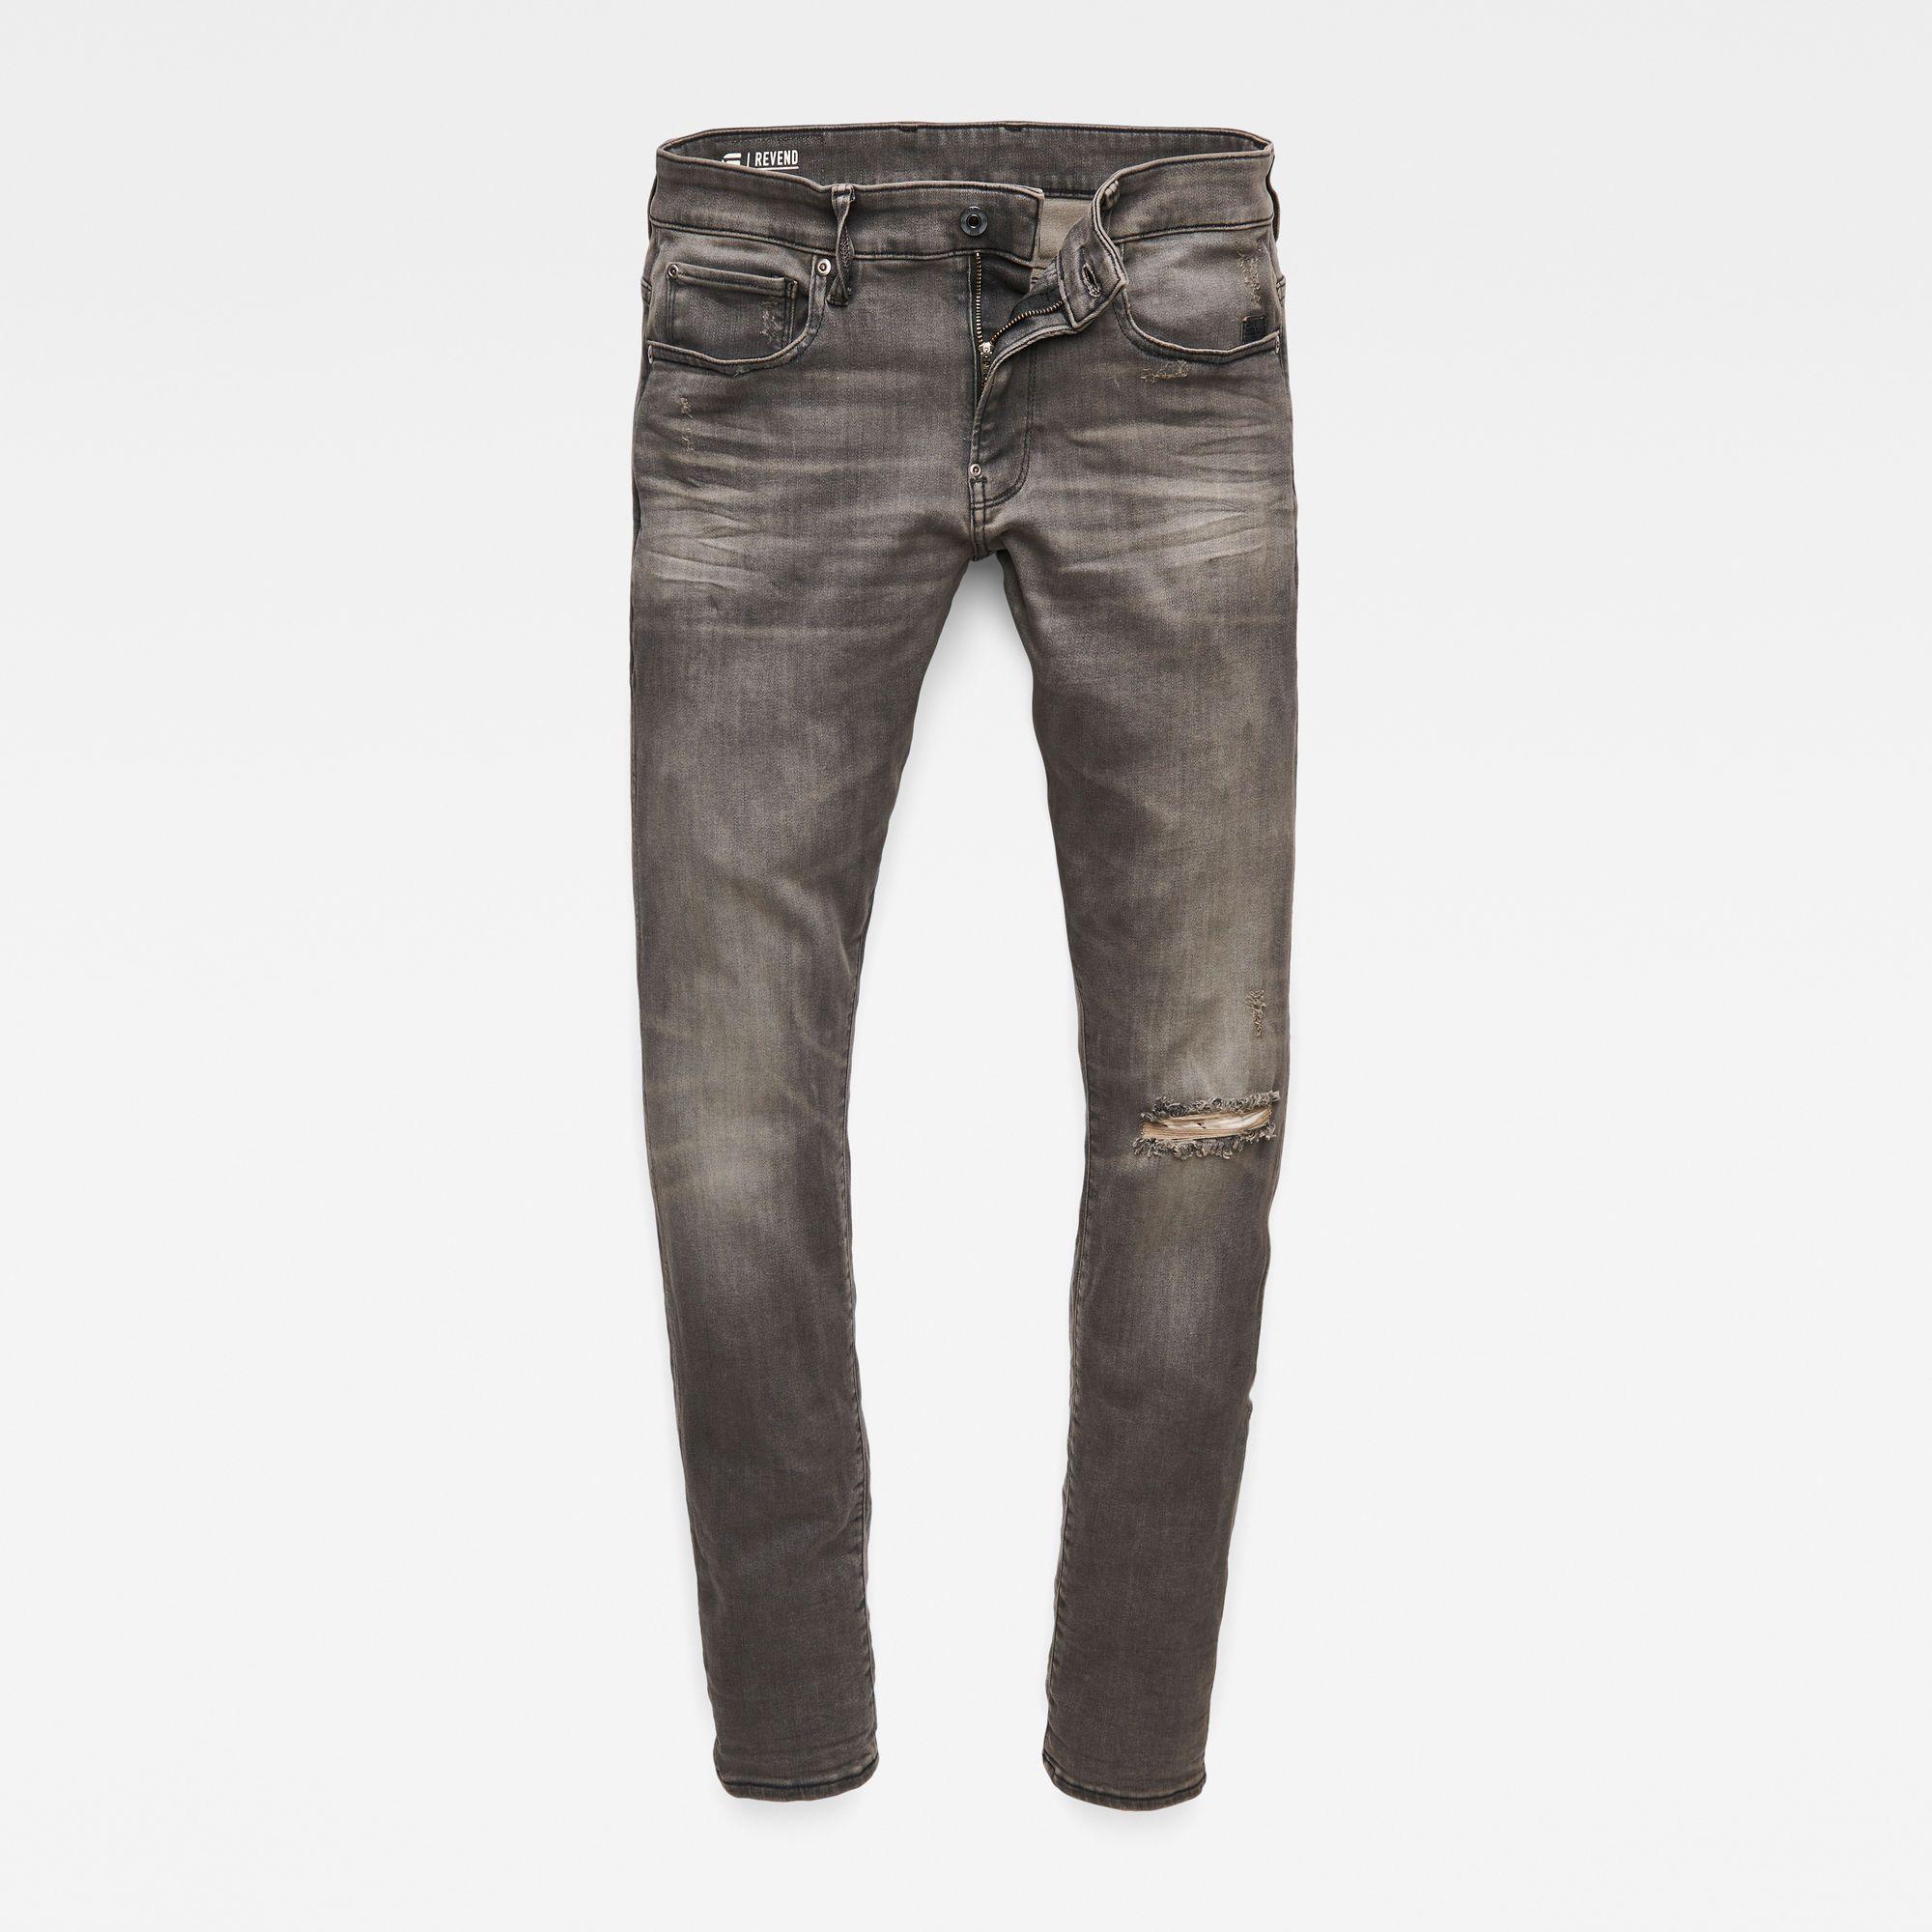 G-Star RAW Revend Skinny Jeans